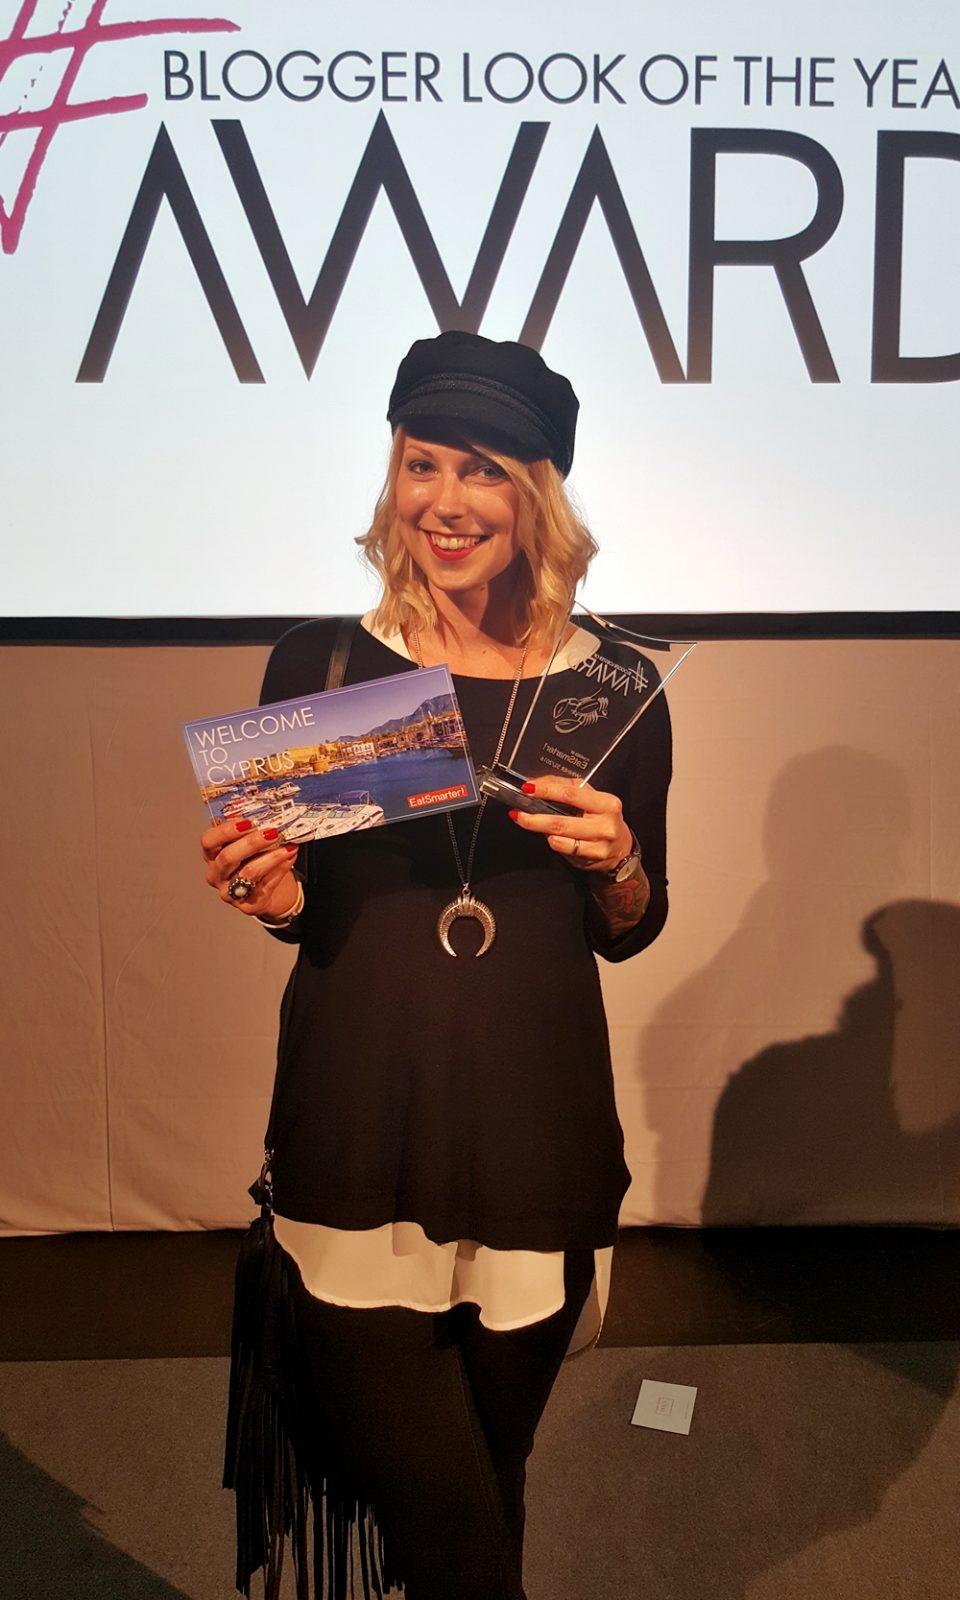 Blogger Lobster of the Year Award Blogger Look of the Year Award Hamburg (8)